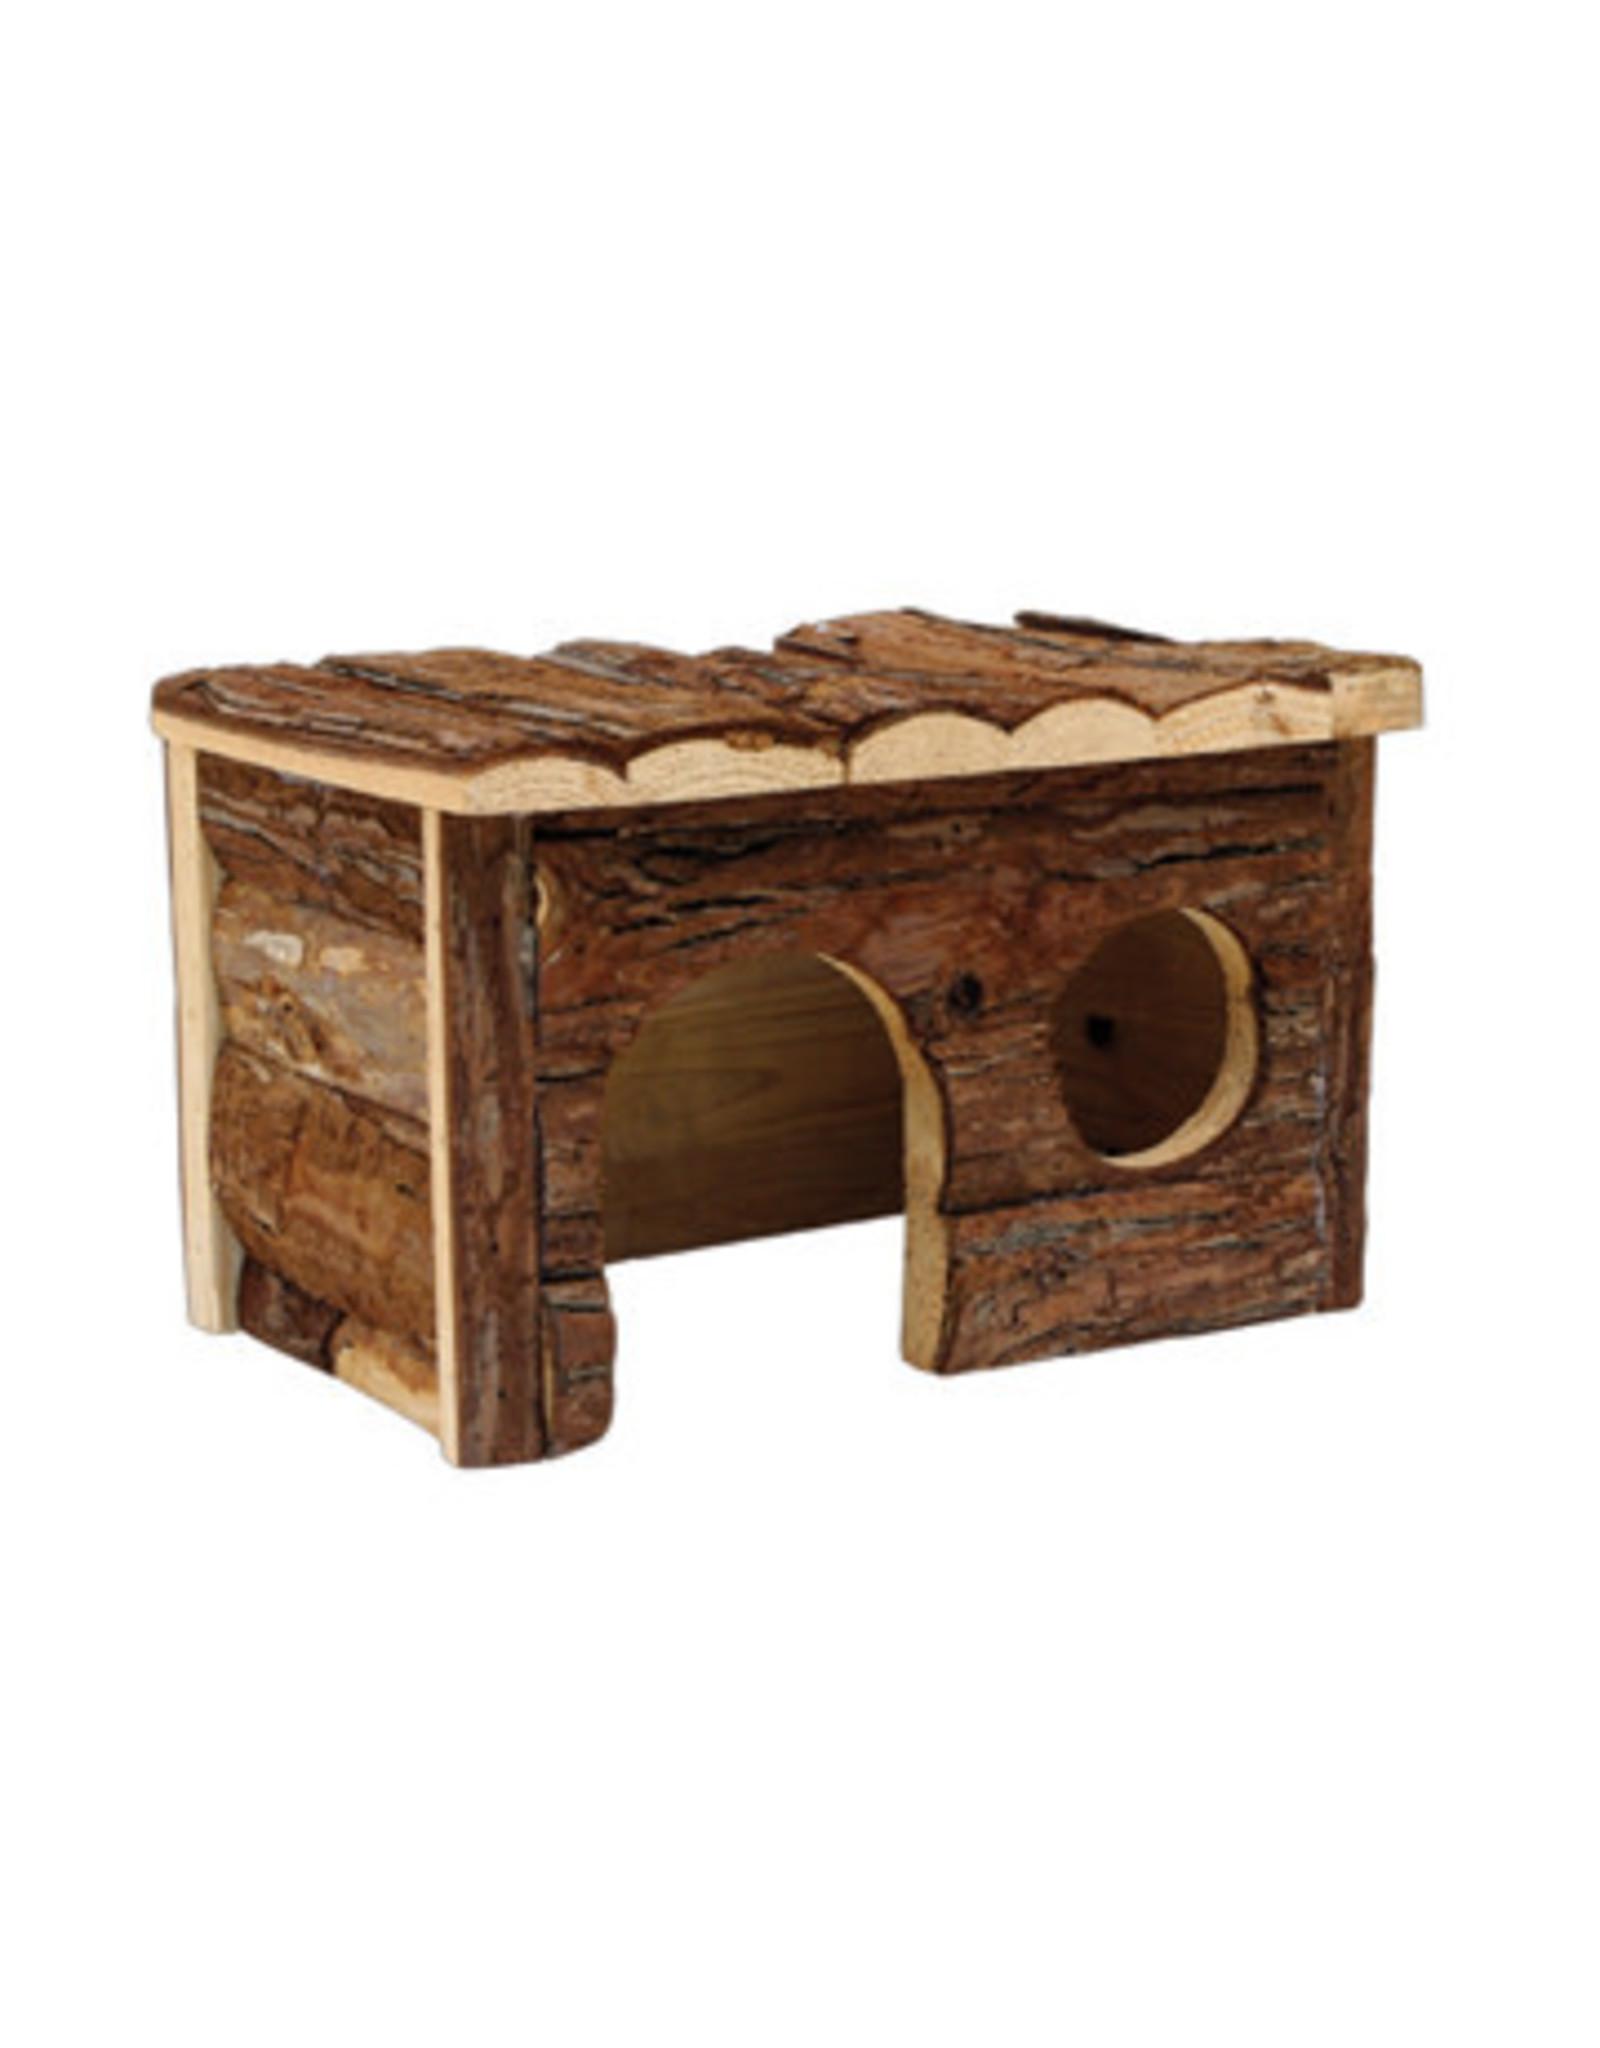 "Living World Tree House Real Wood Cabin - Medium - 28 cm (11"") L x 17.5 cm (7"") W x 17.5 cm (7"") H"